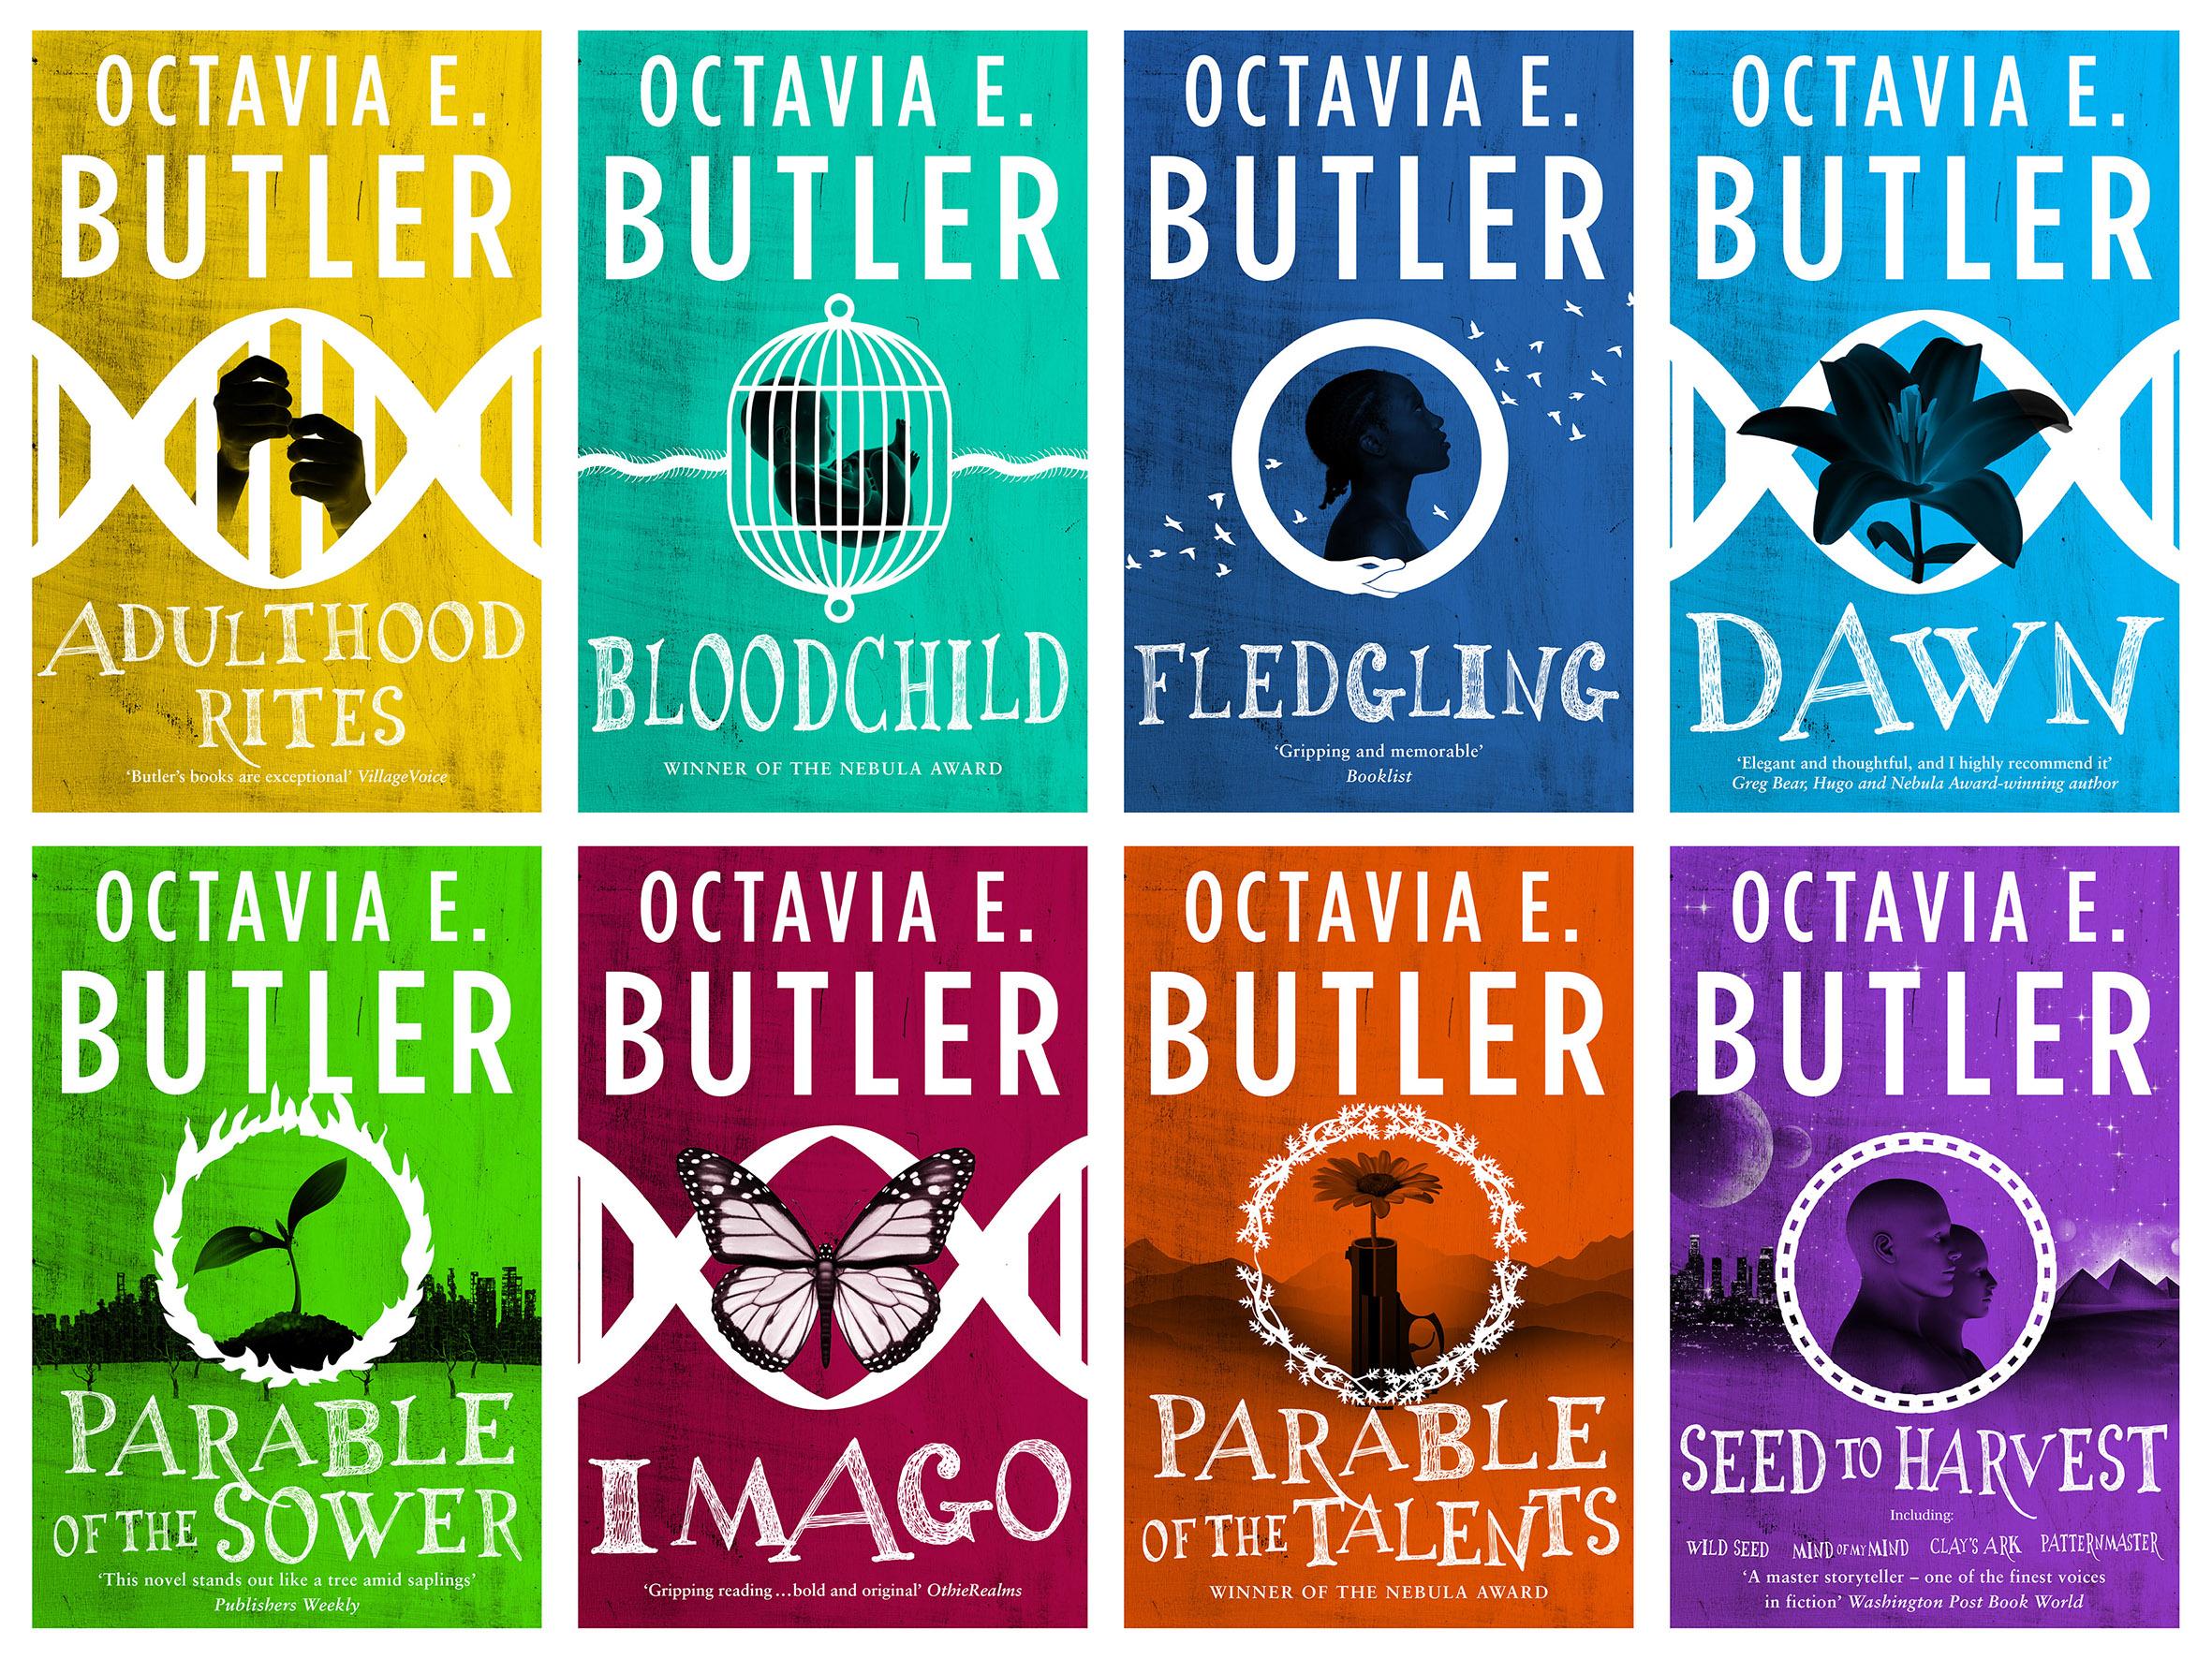 Octavia E Butler, African American Author, African American Literature, Patternmaster, Kindred, Xenogenesis, KOLUMN Magazine, KOLUMN